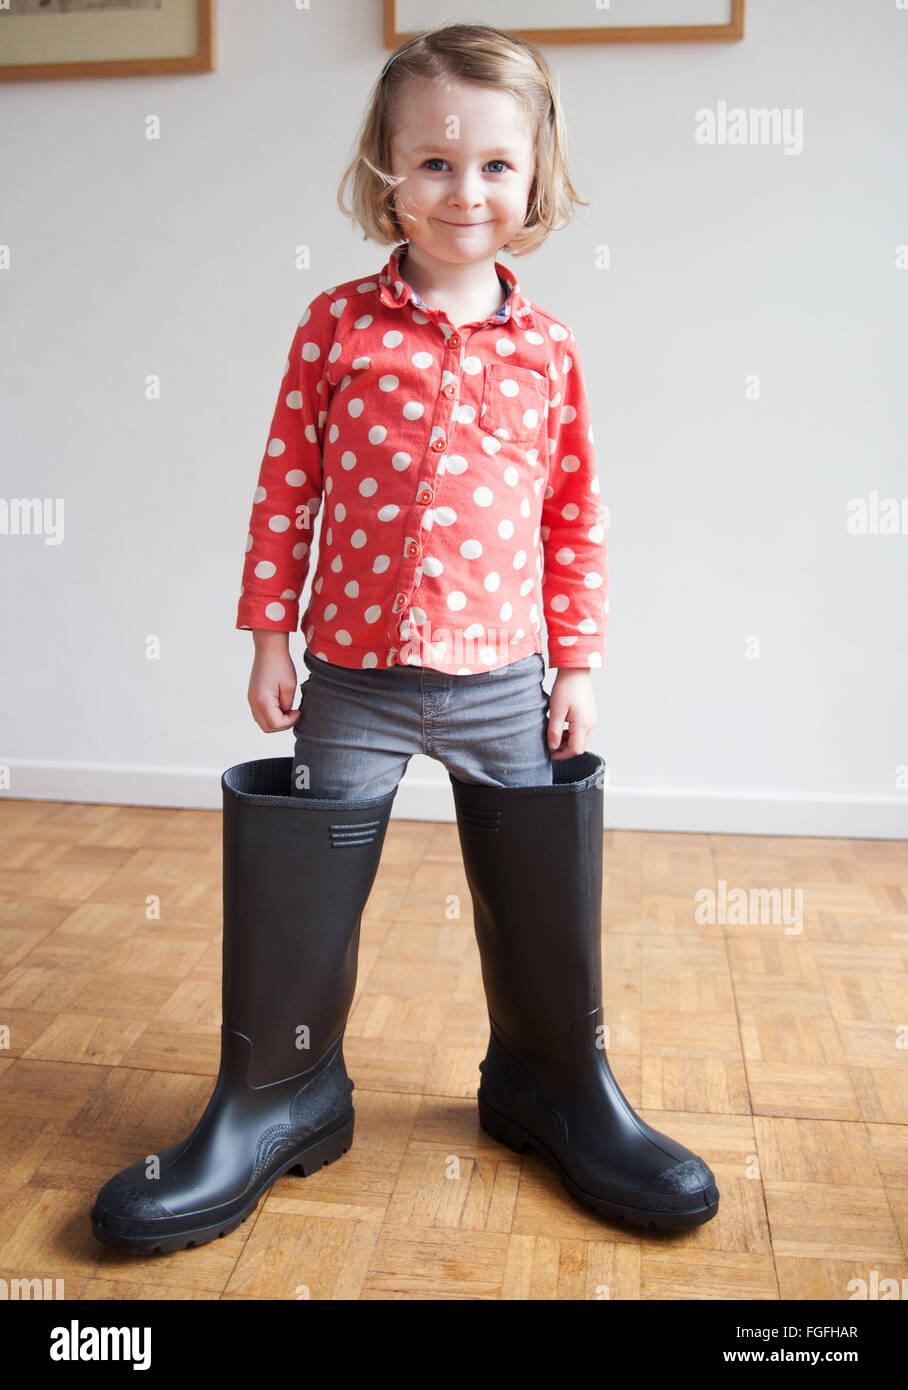 Big boot girl - Stock Image